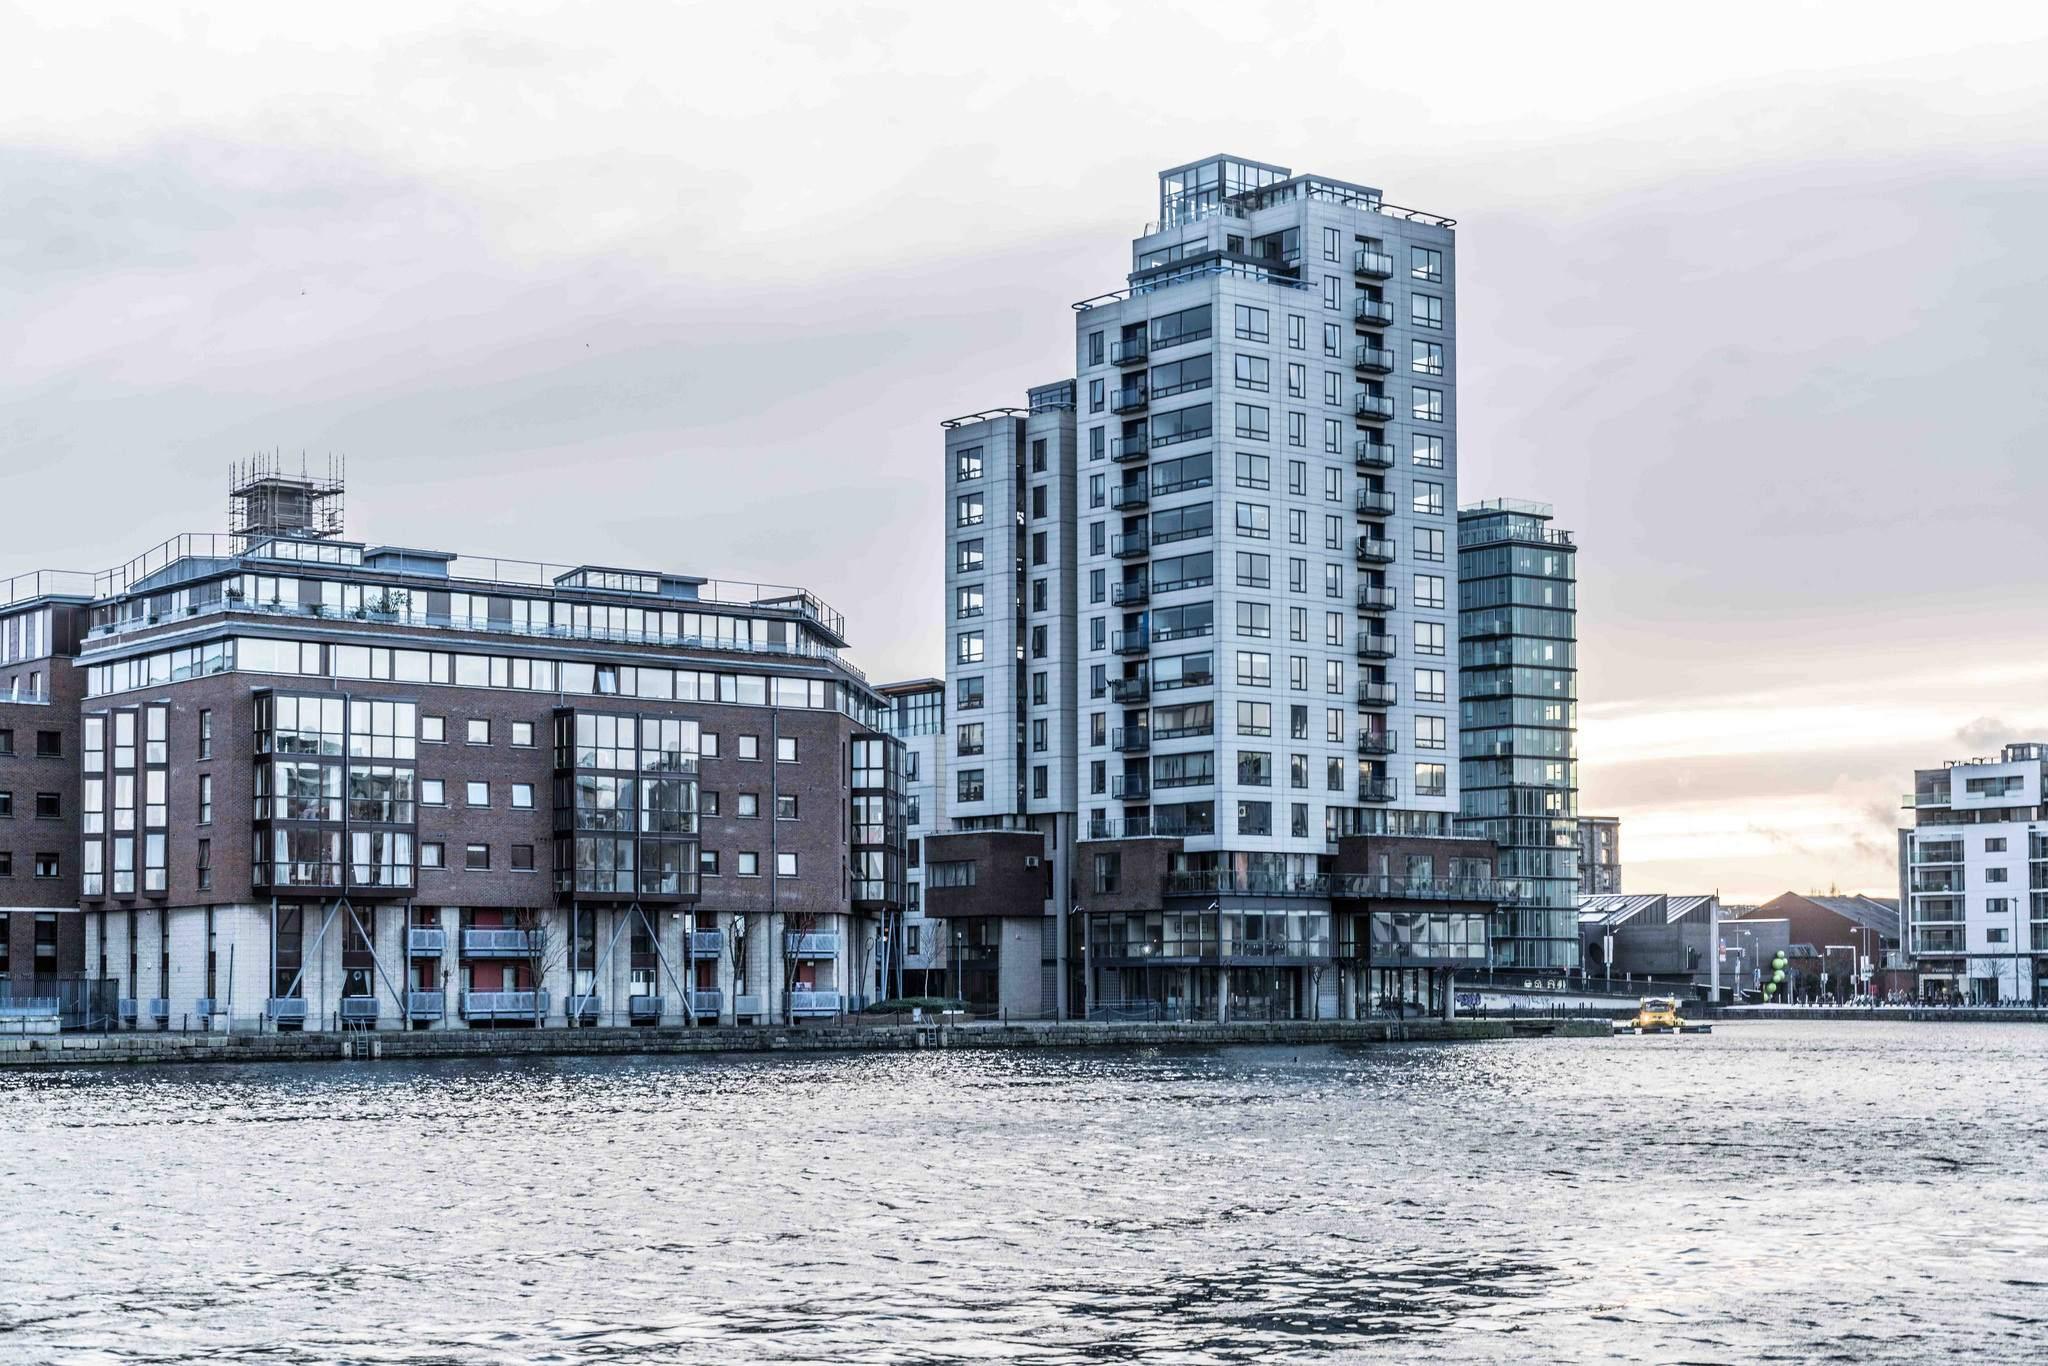 dublin docklands12 Walking Around Dublin Docklands by Marphy